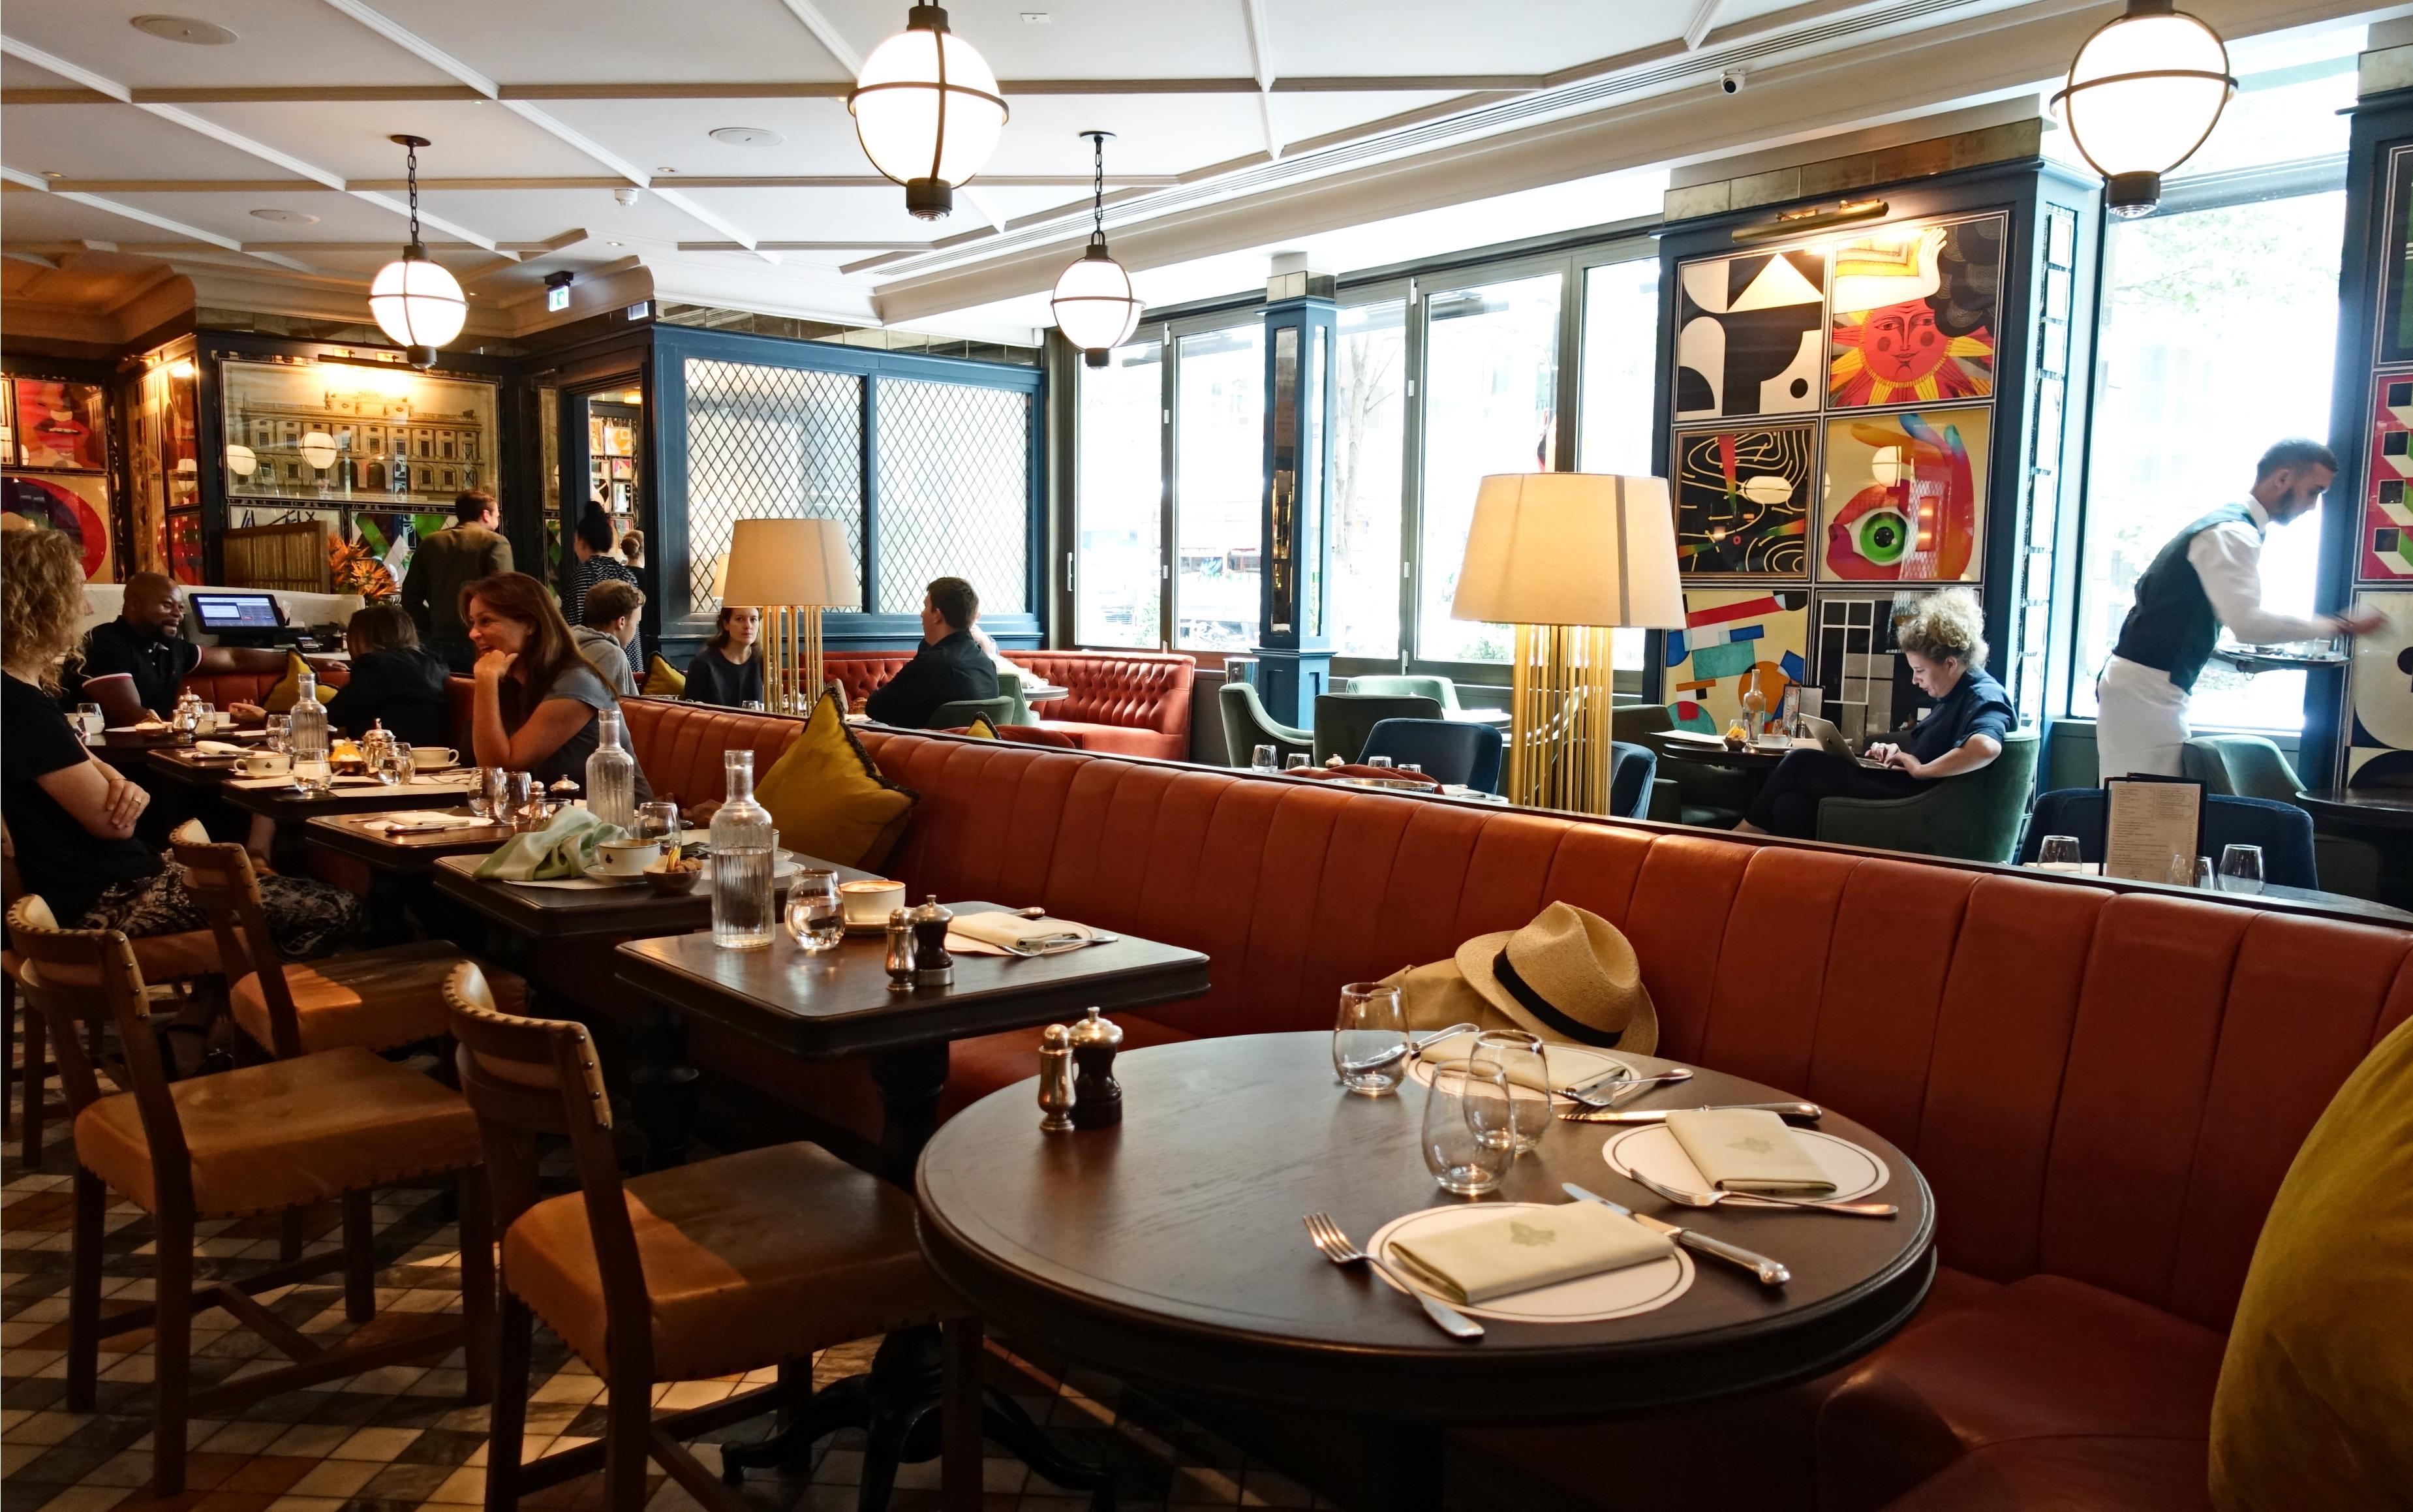 London] Full English breakfast at The Ivy Soho Brasserie - U.K. ...